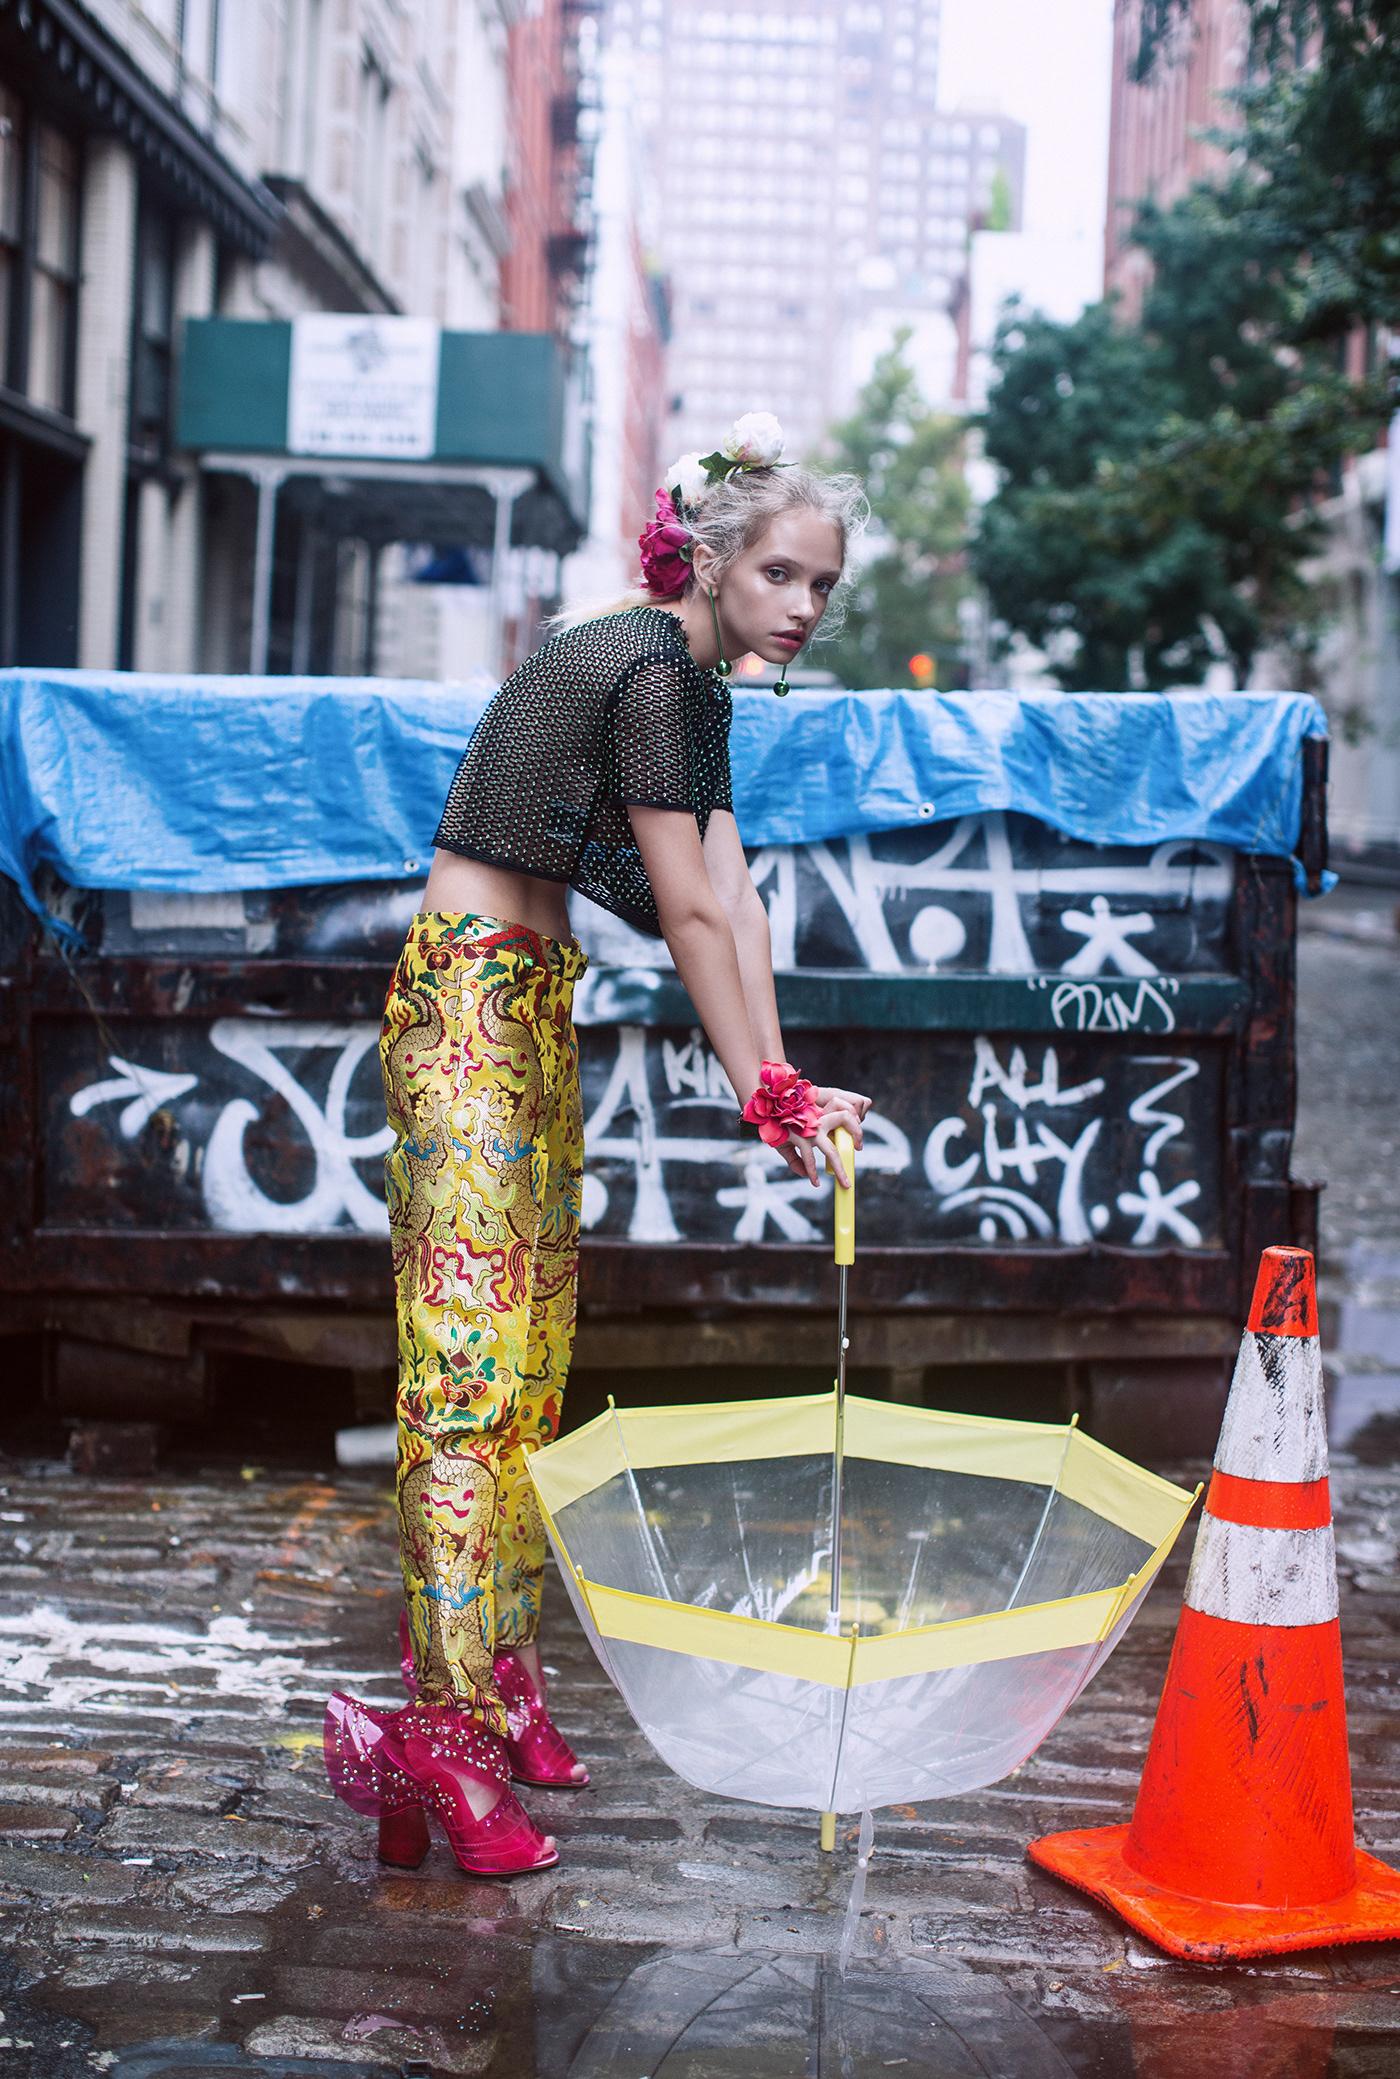 Flower needs some water in the city / фотограф Ekaterina Belinskaya